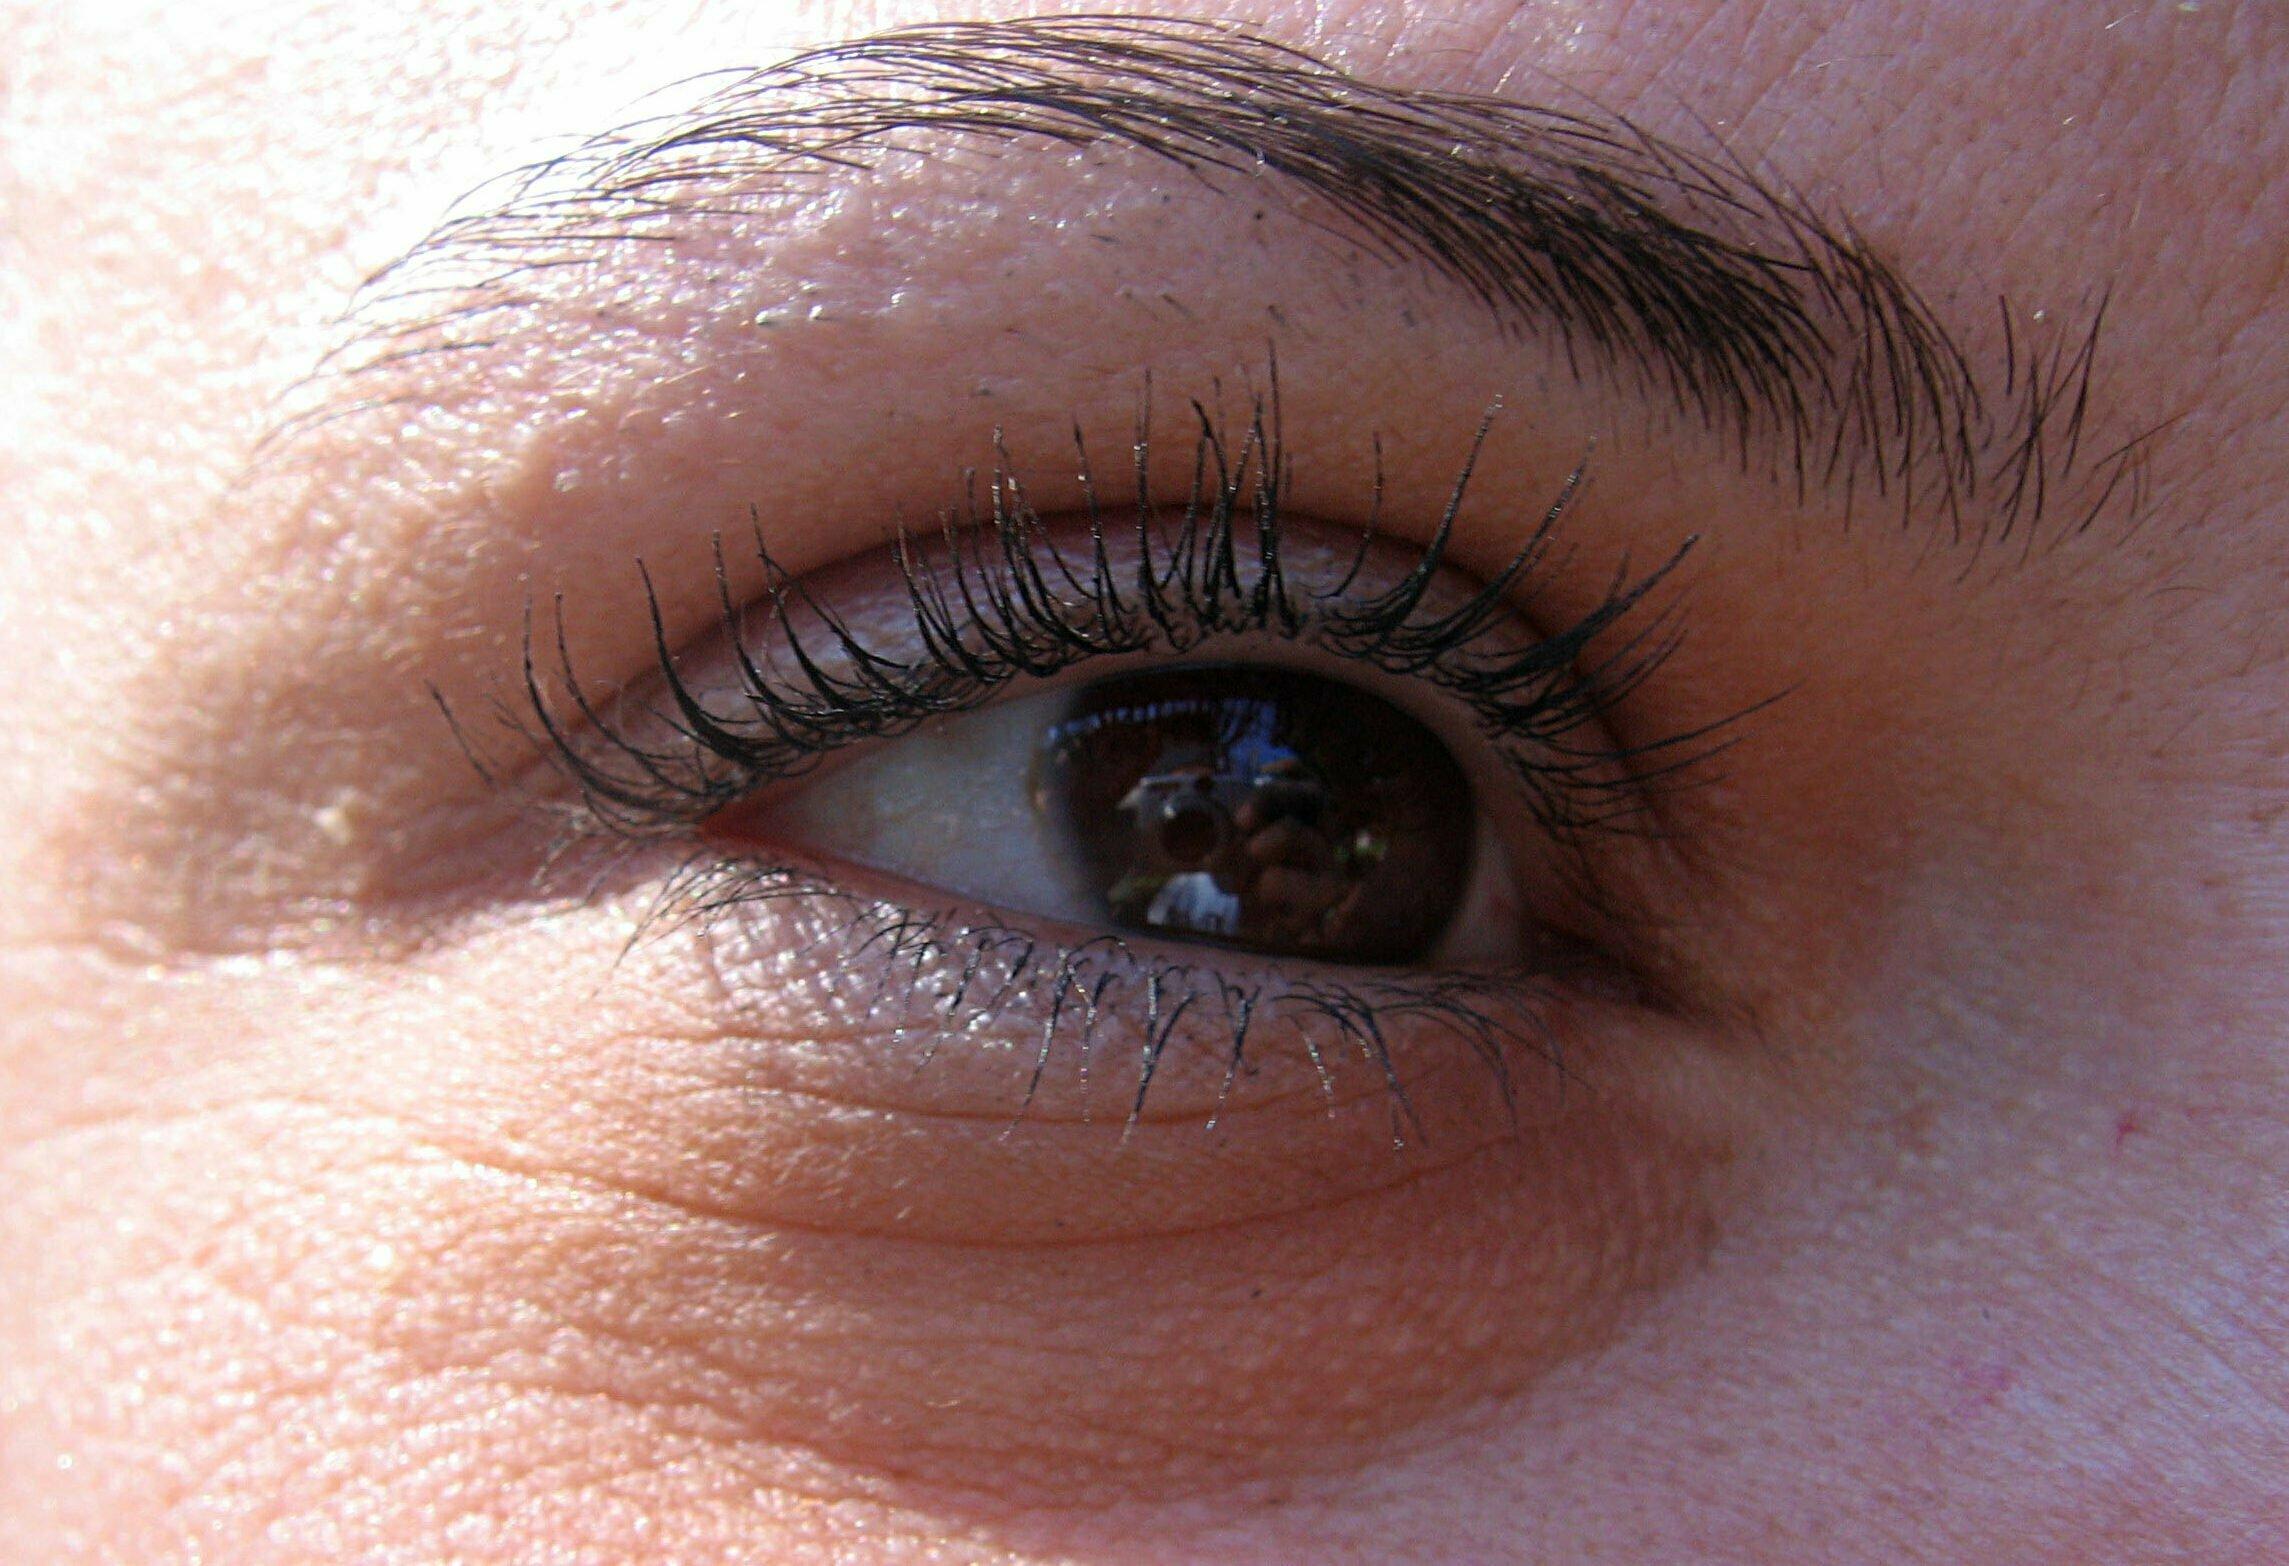 How to Grow Long Eyelashes